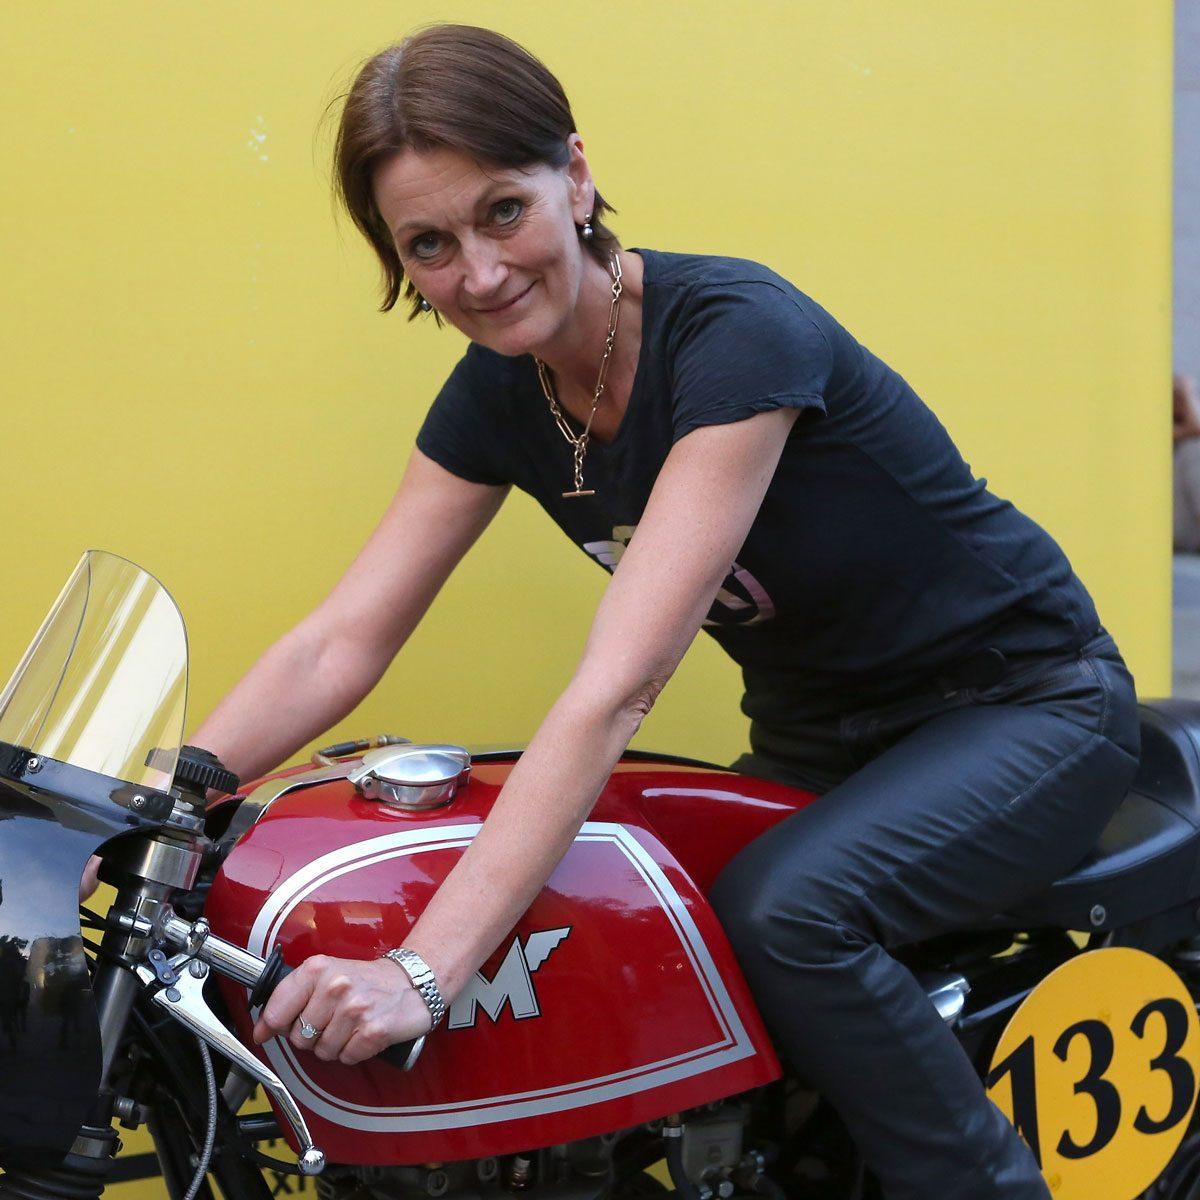 Portrait of Elspeth Beard on a motorcycle